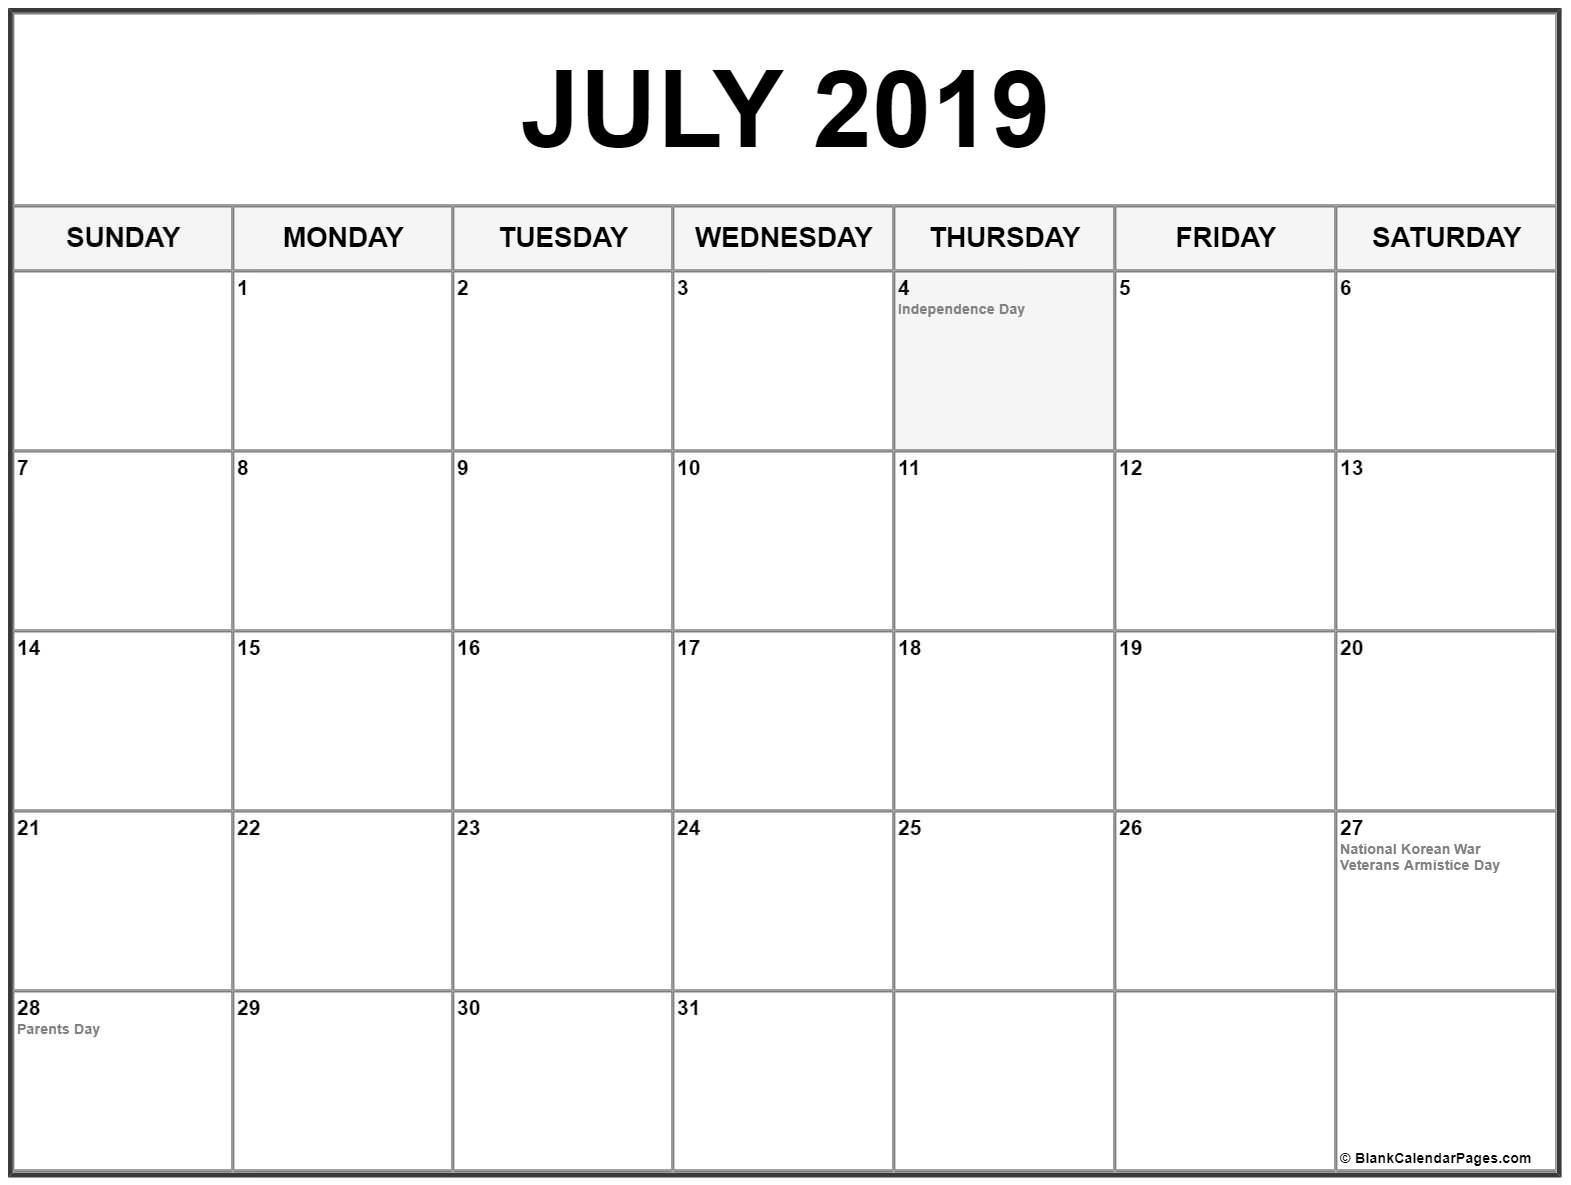 July 2019 Calendar With Holidays #july #july2019 #julycalendar2019 pertaining to Calendar With Holidays Templates